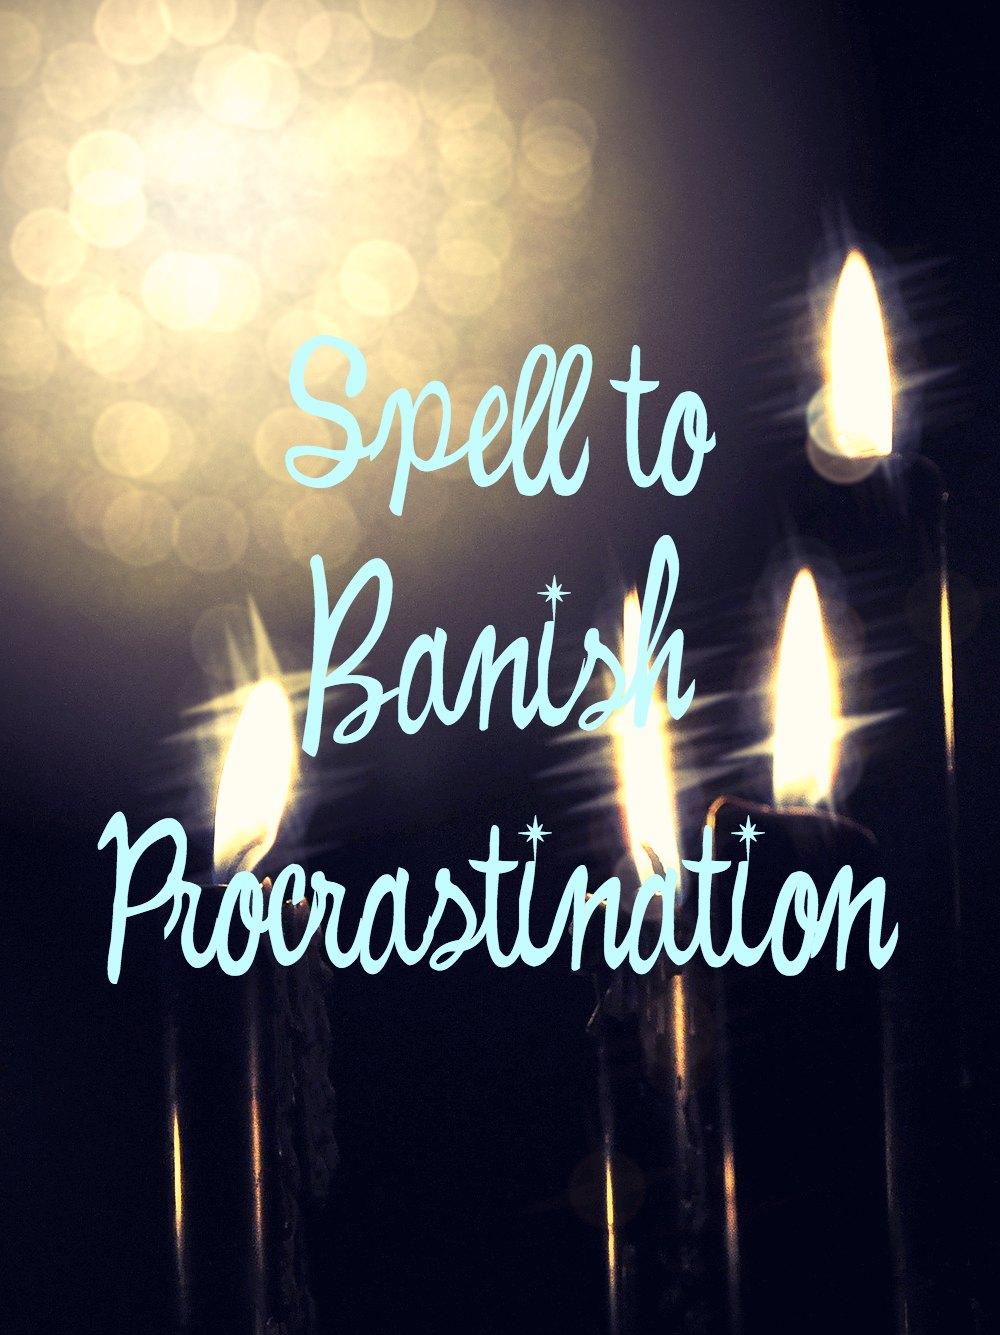 Spell to overcome procrastination